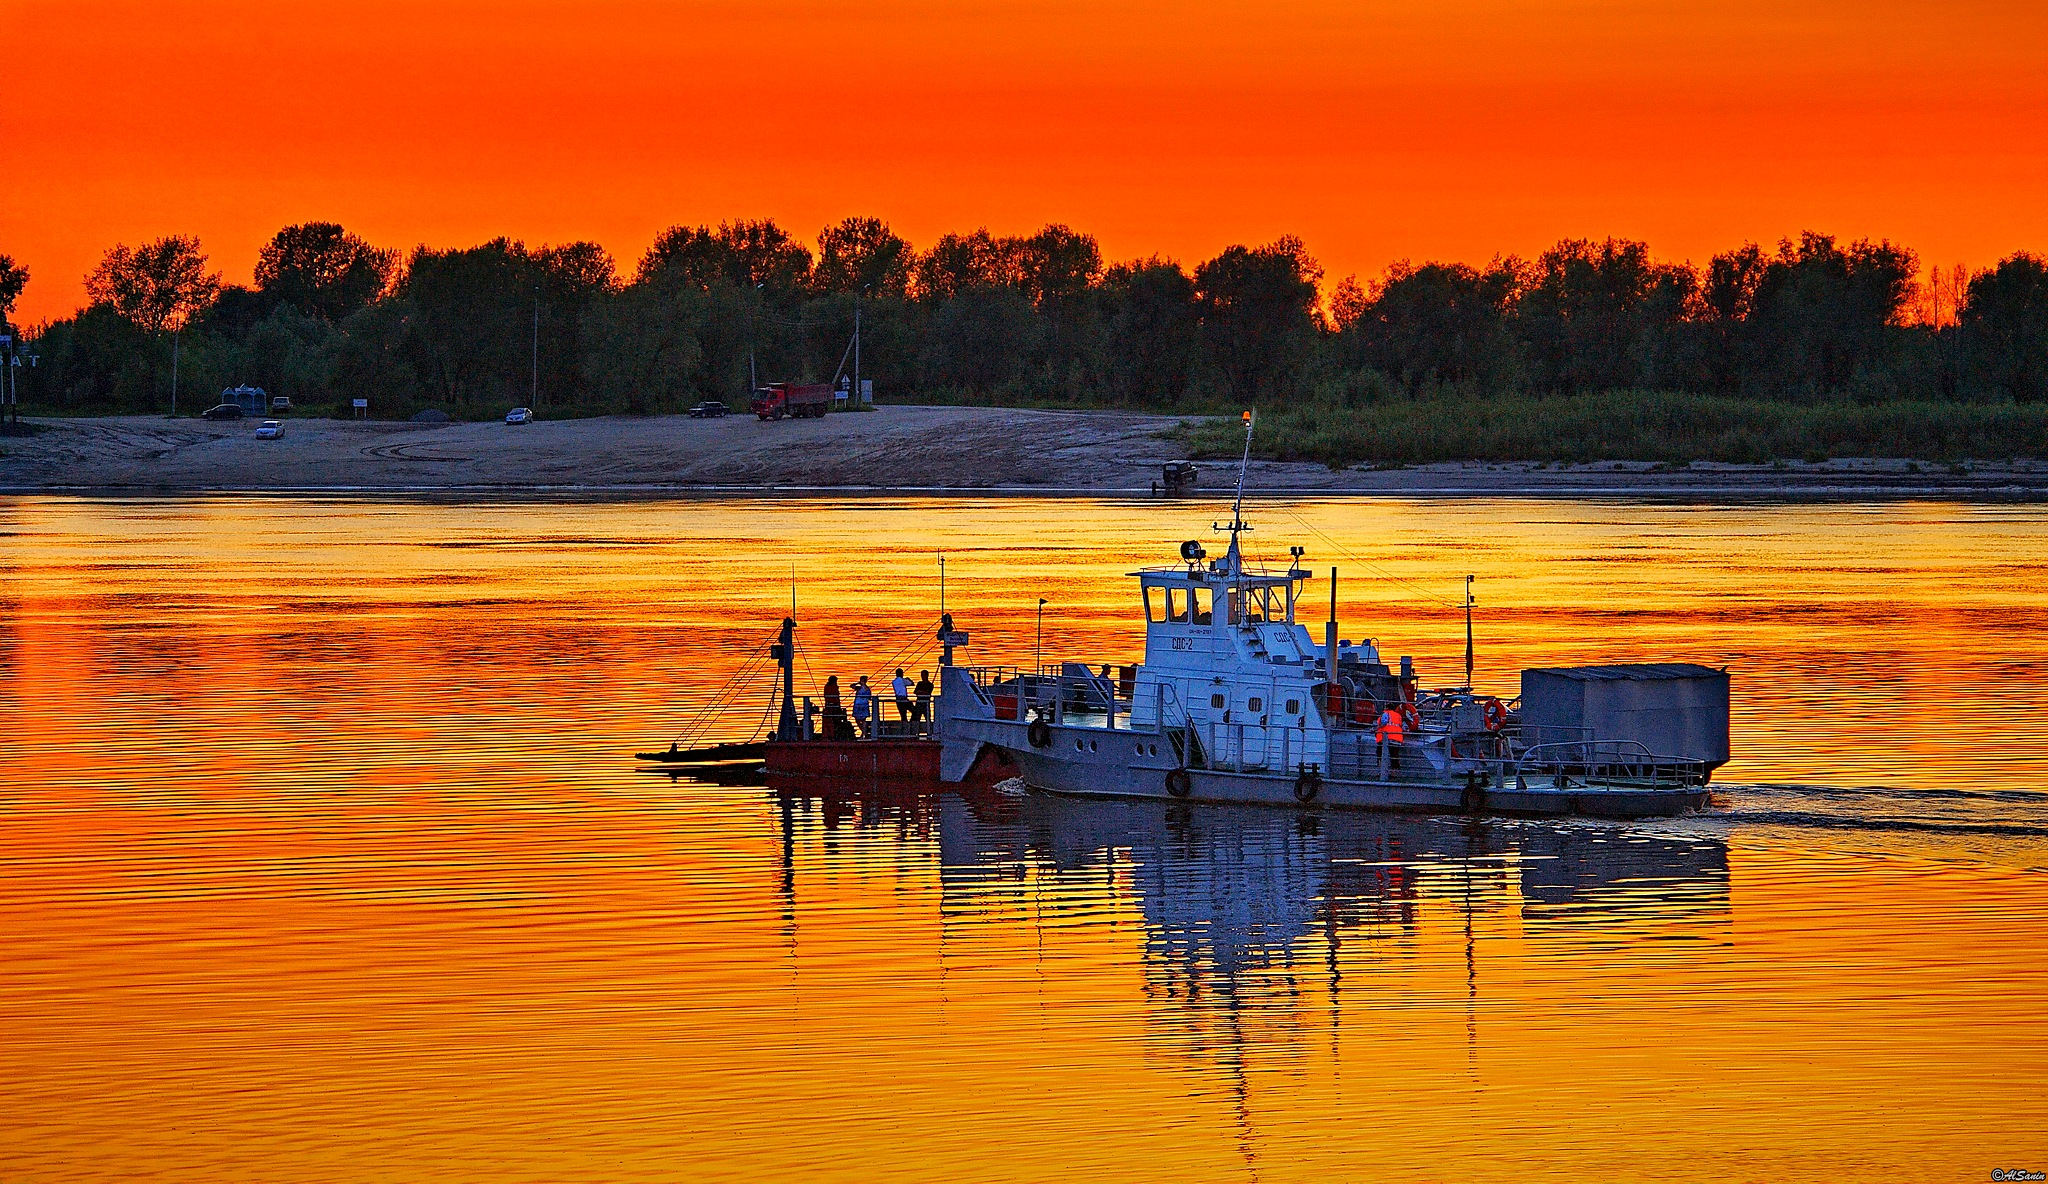 On Irtysh river. Siberia. Russia by Al (Alexander)